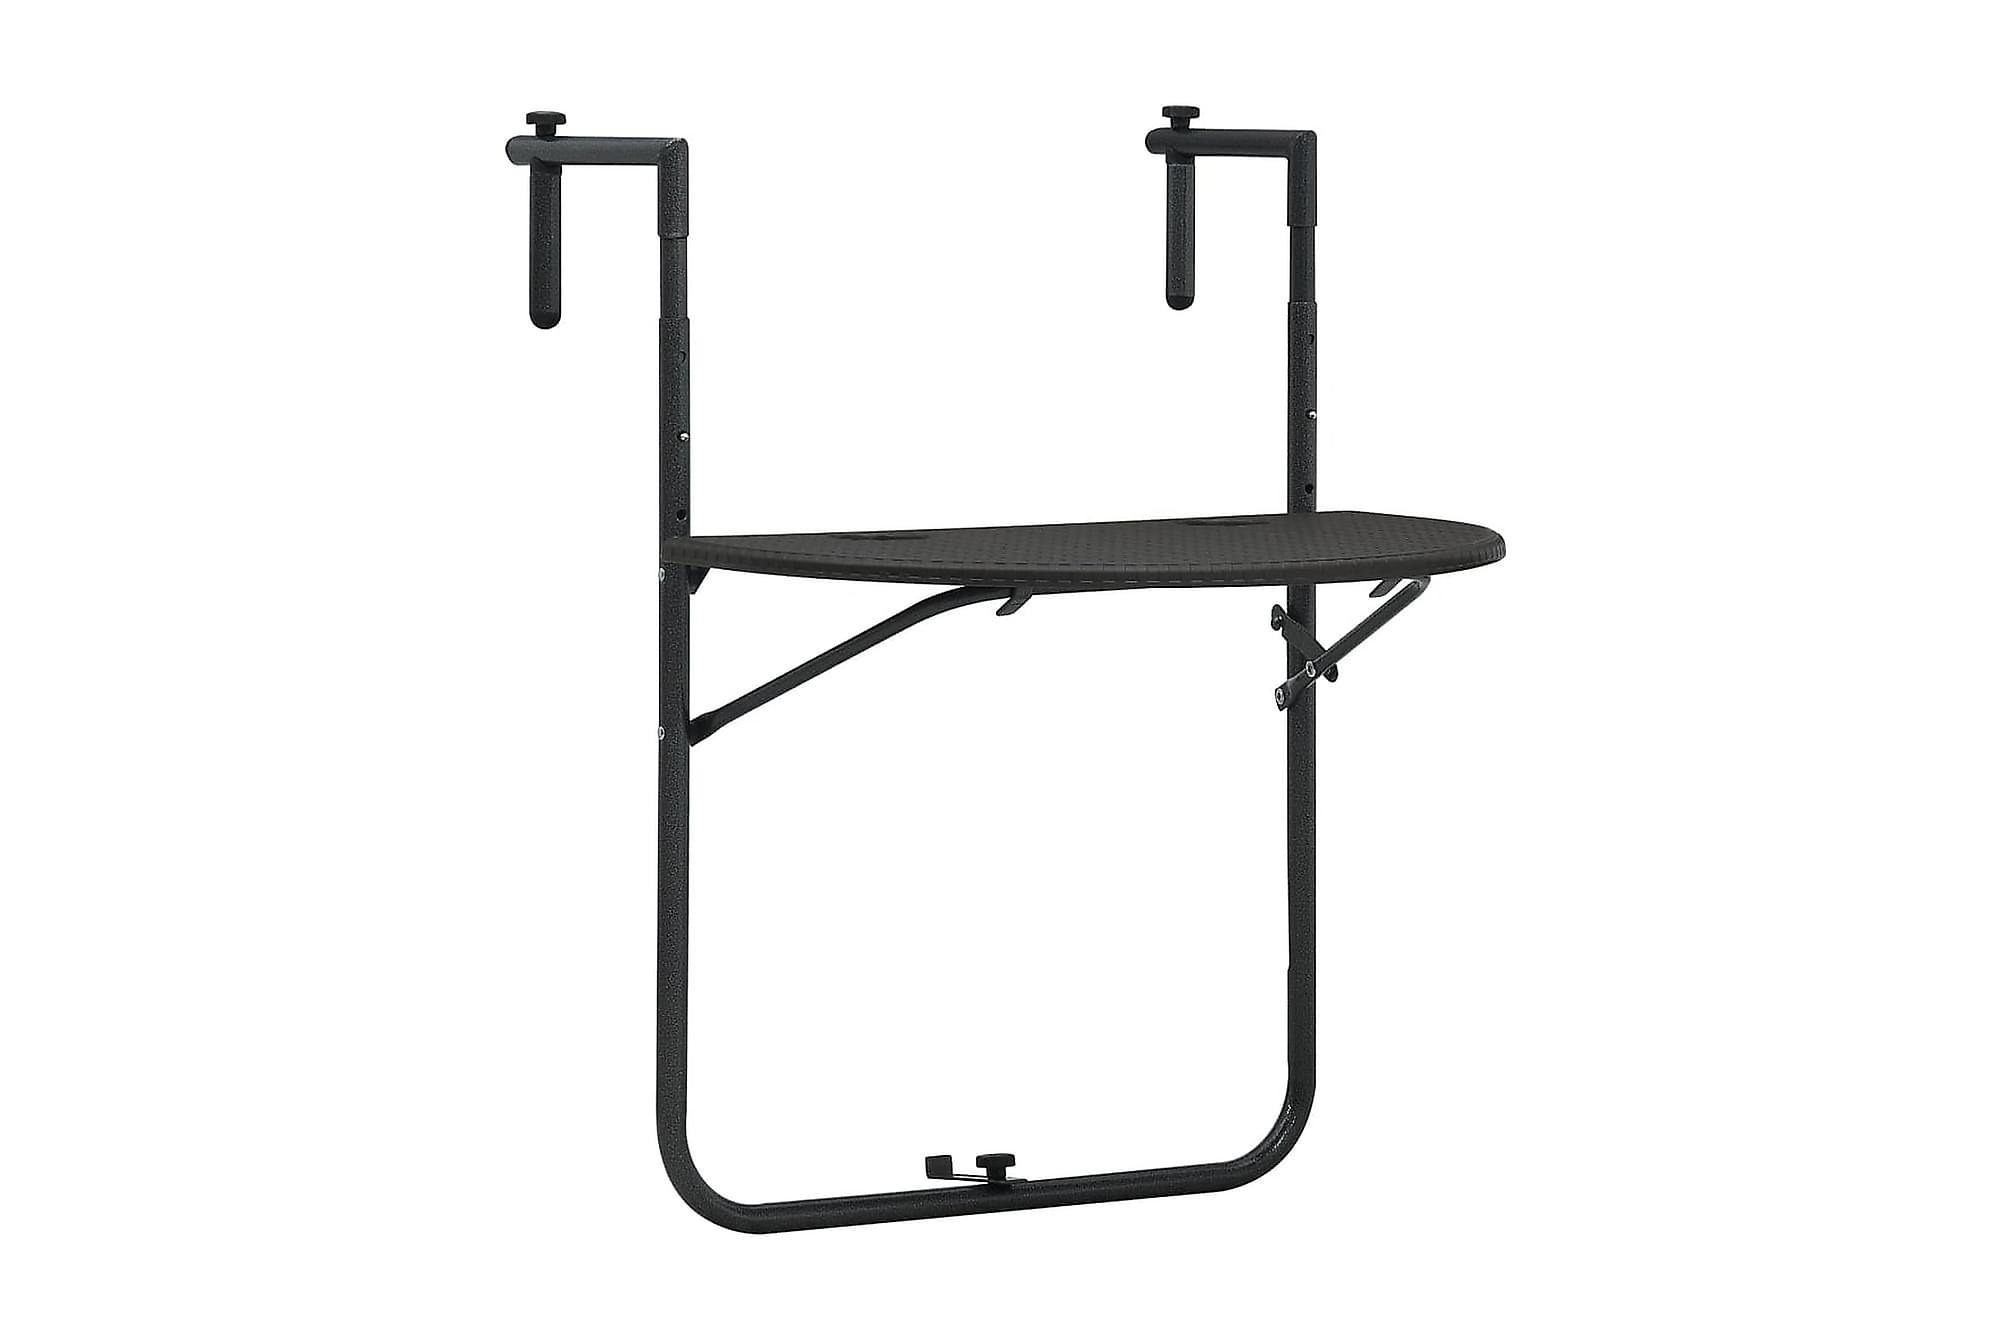 Balkongbord brun 60x64x83,5 cm plast konstrotting, Balkongbord